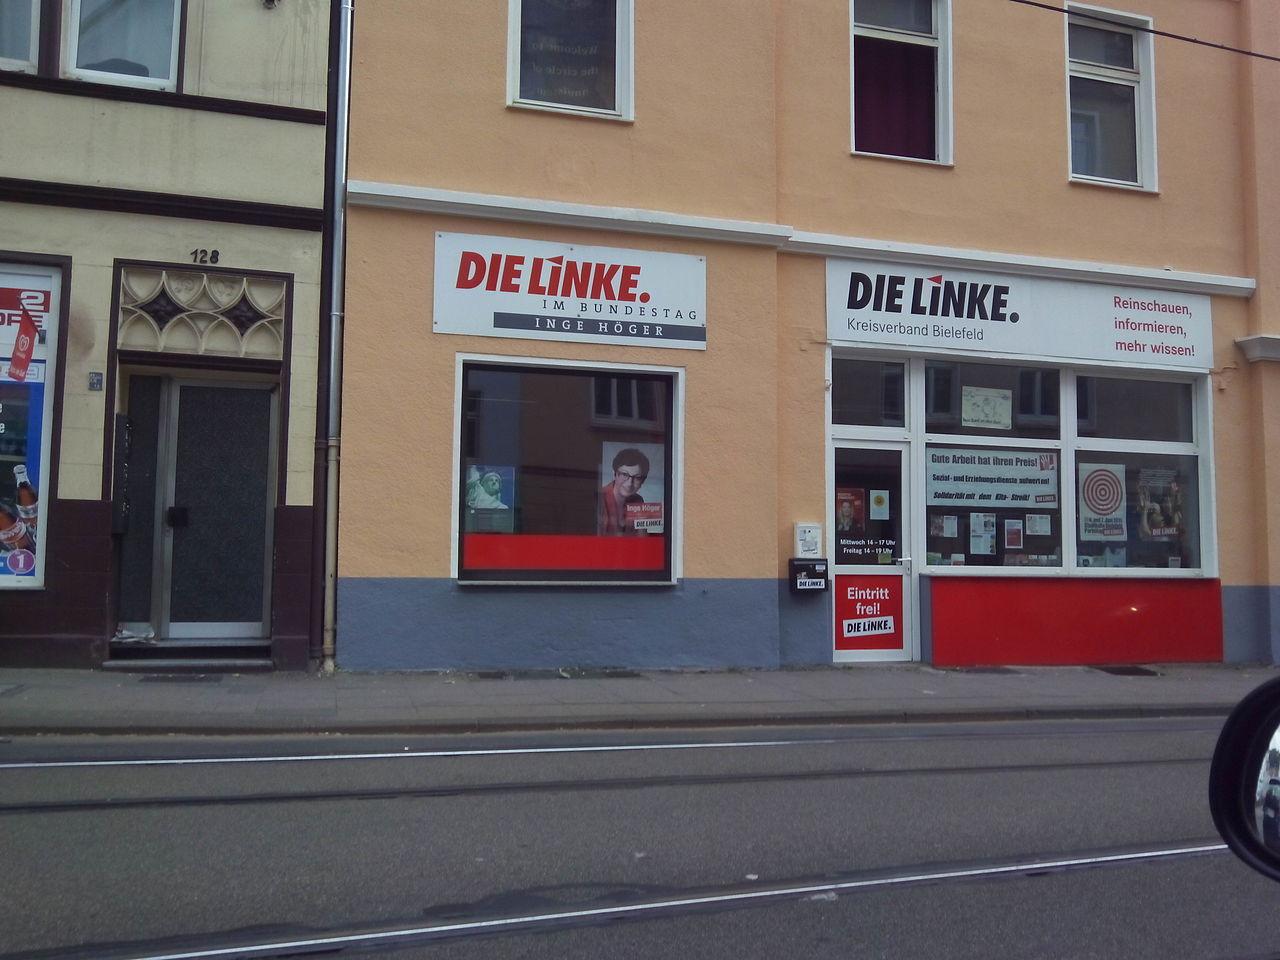 LINKE Büro des Kreisverbandes Bielefeld.jpg